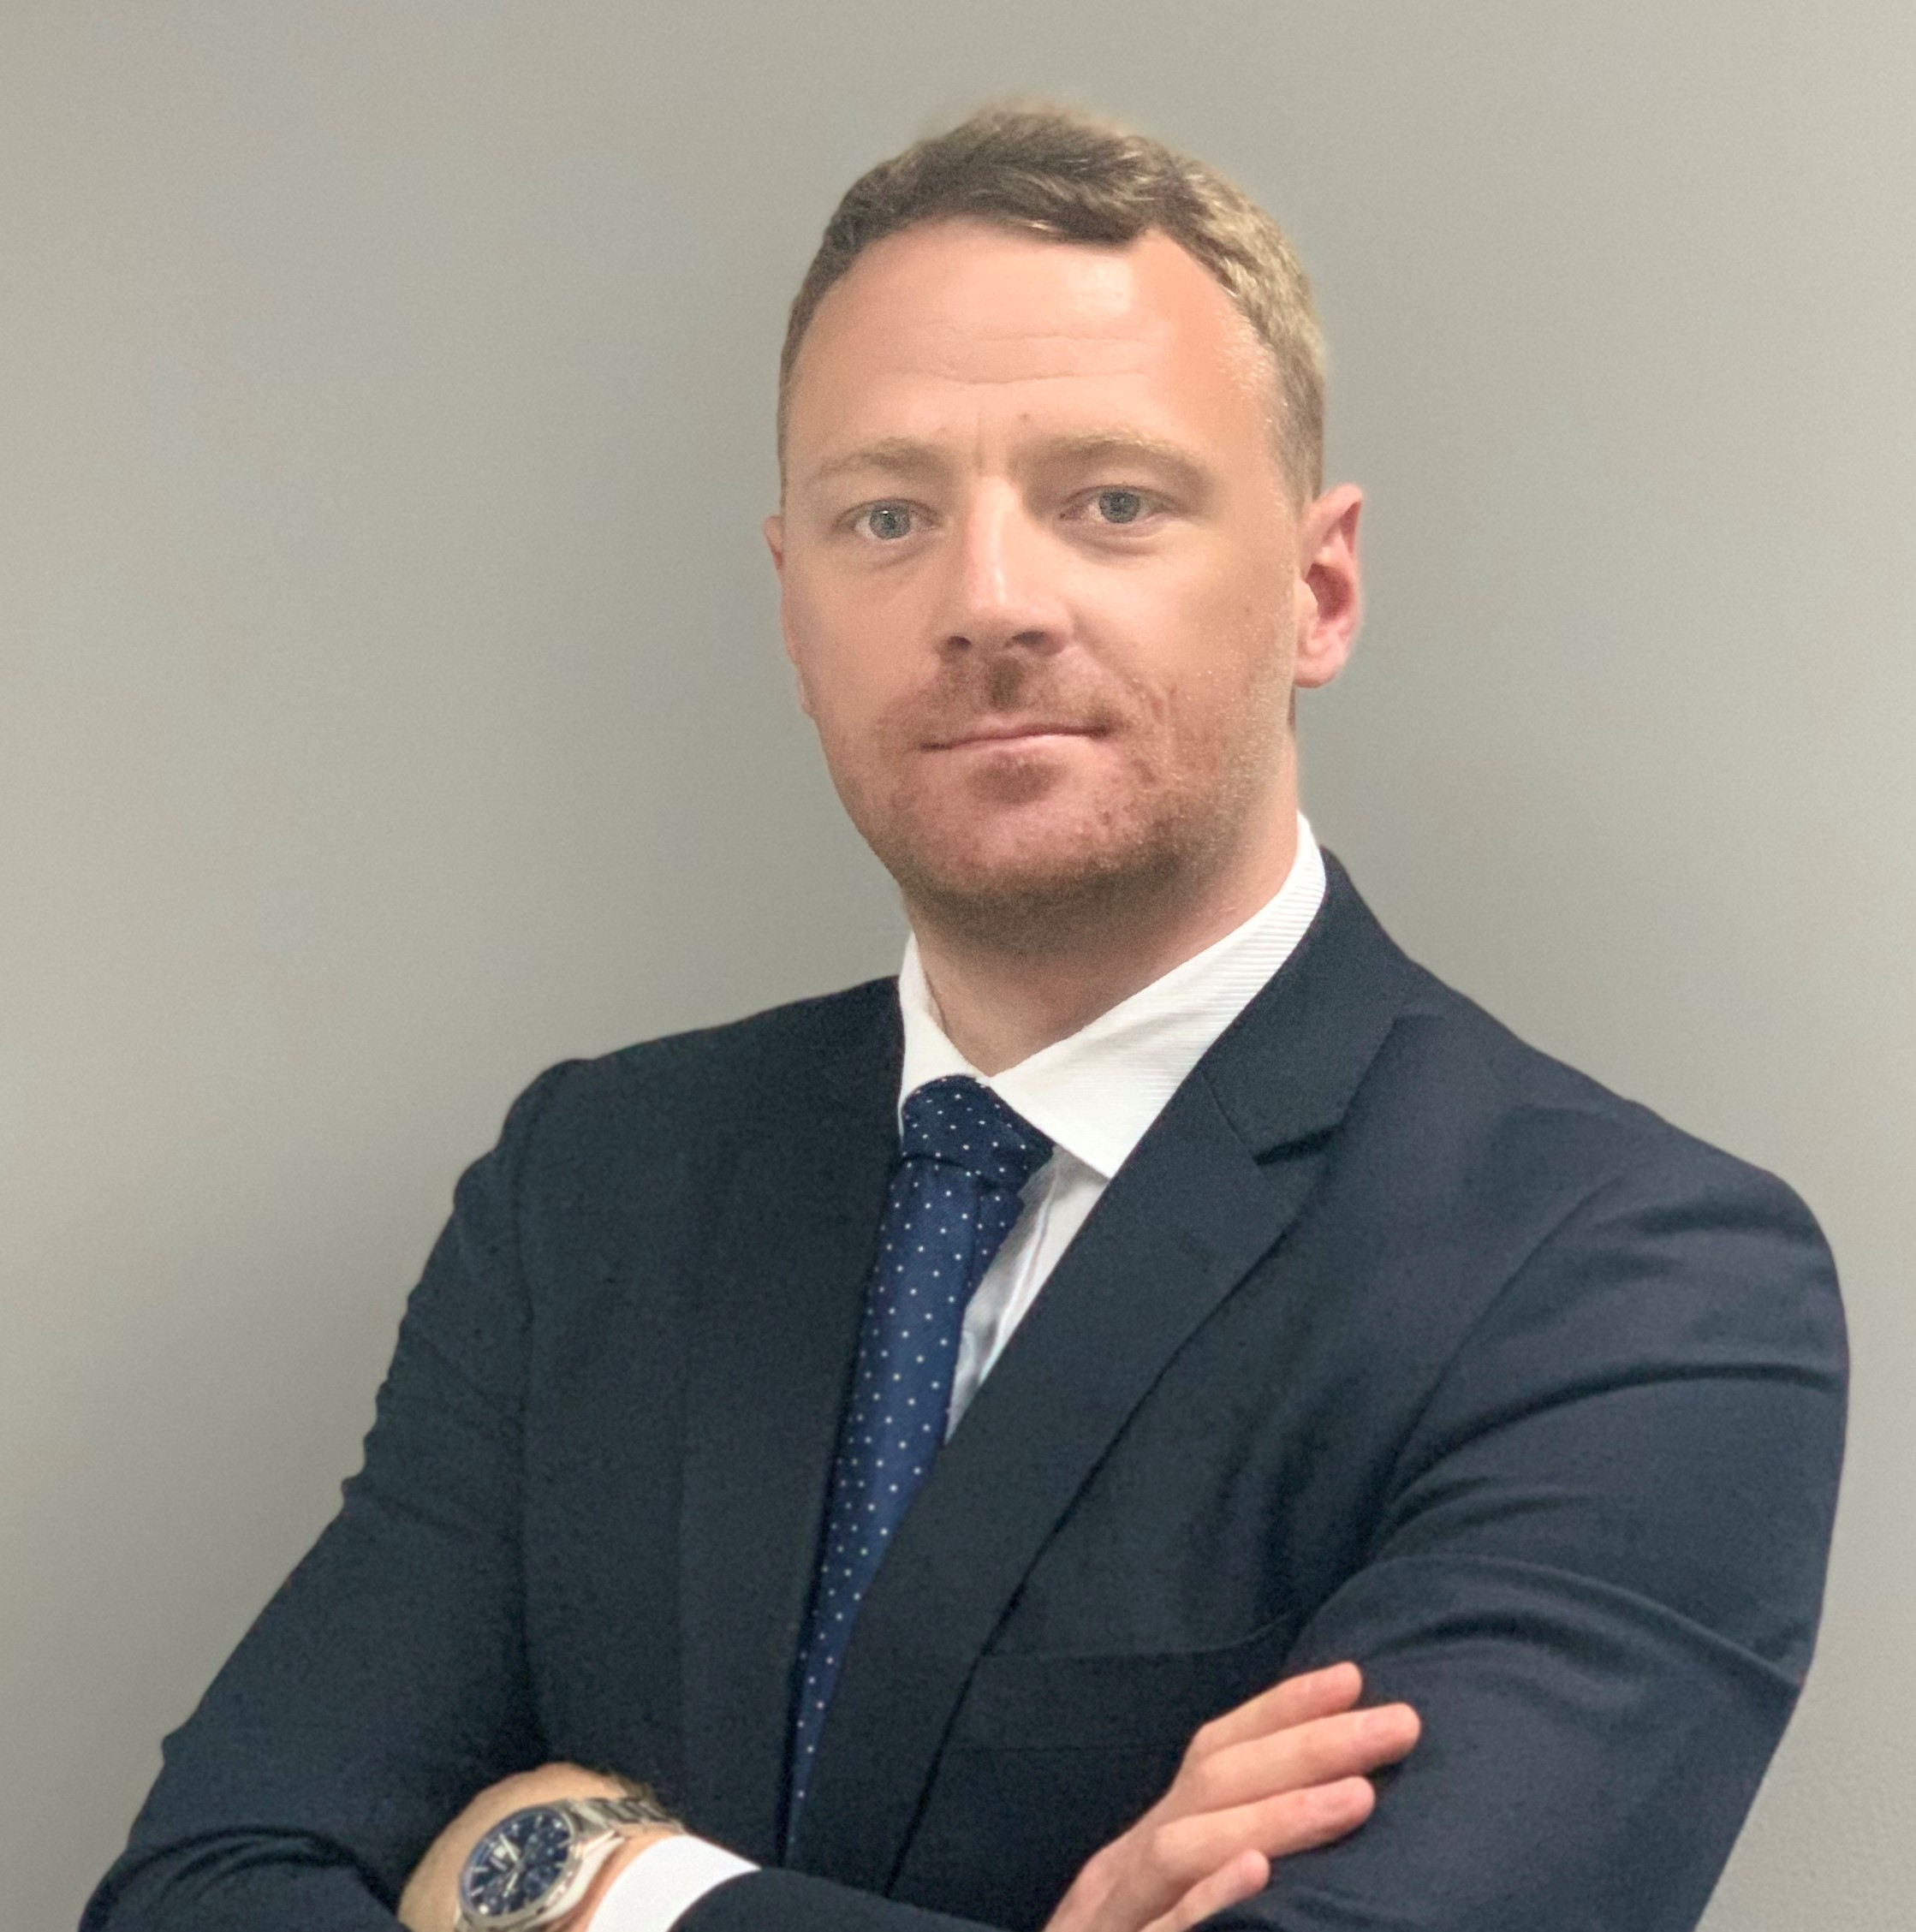 Craig O'Sullivan